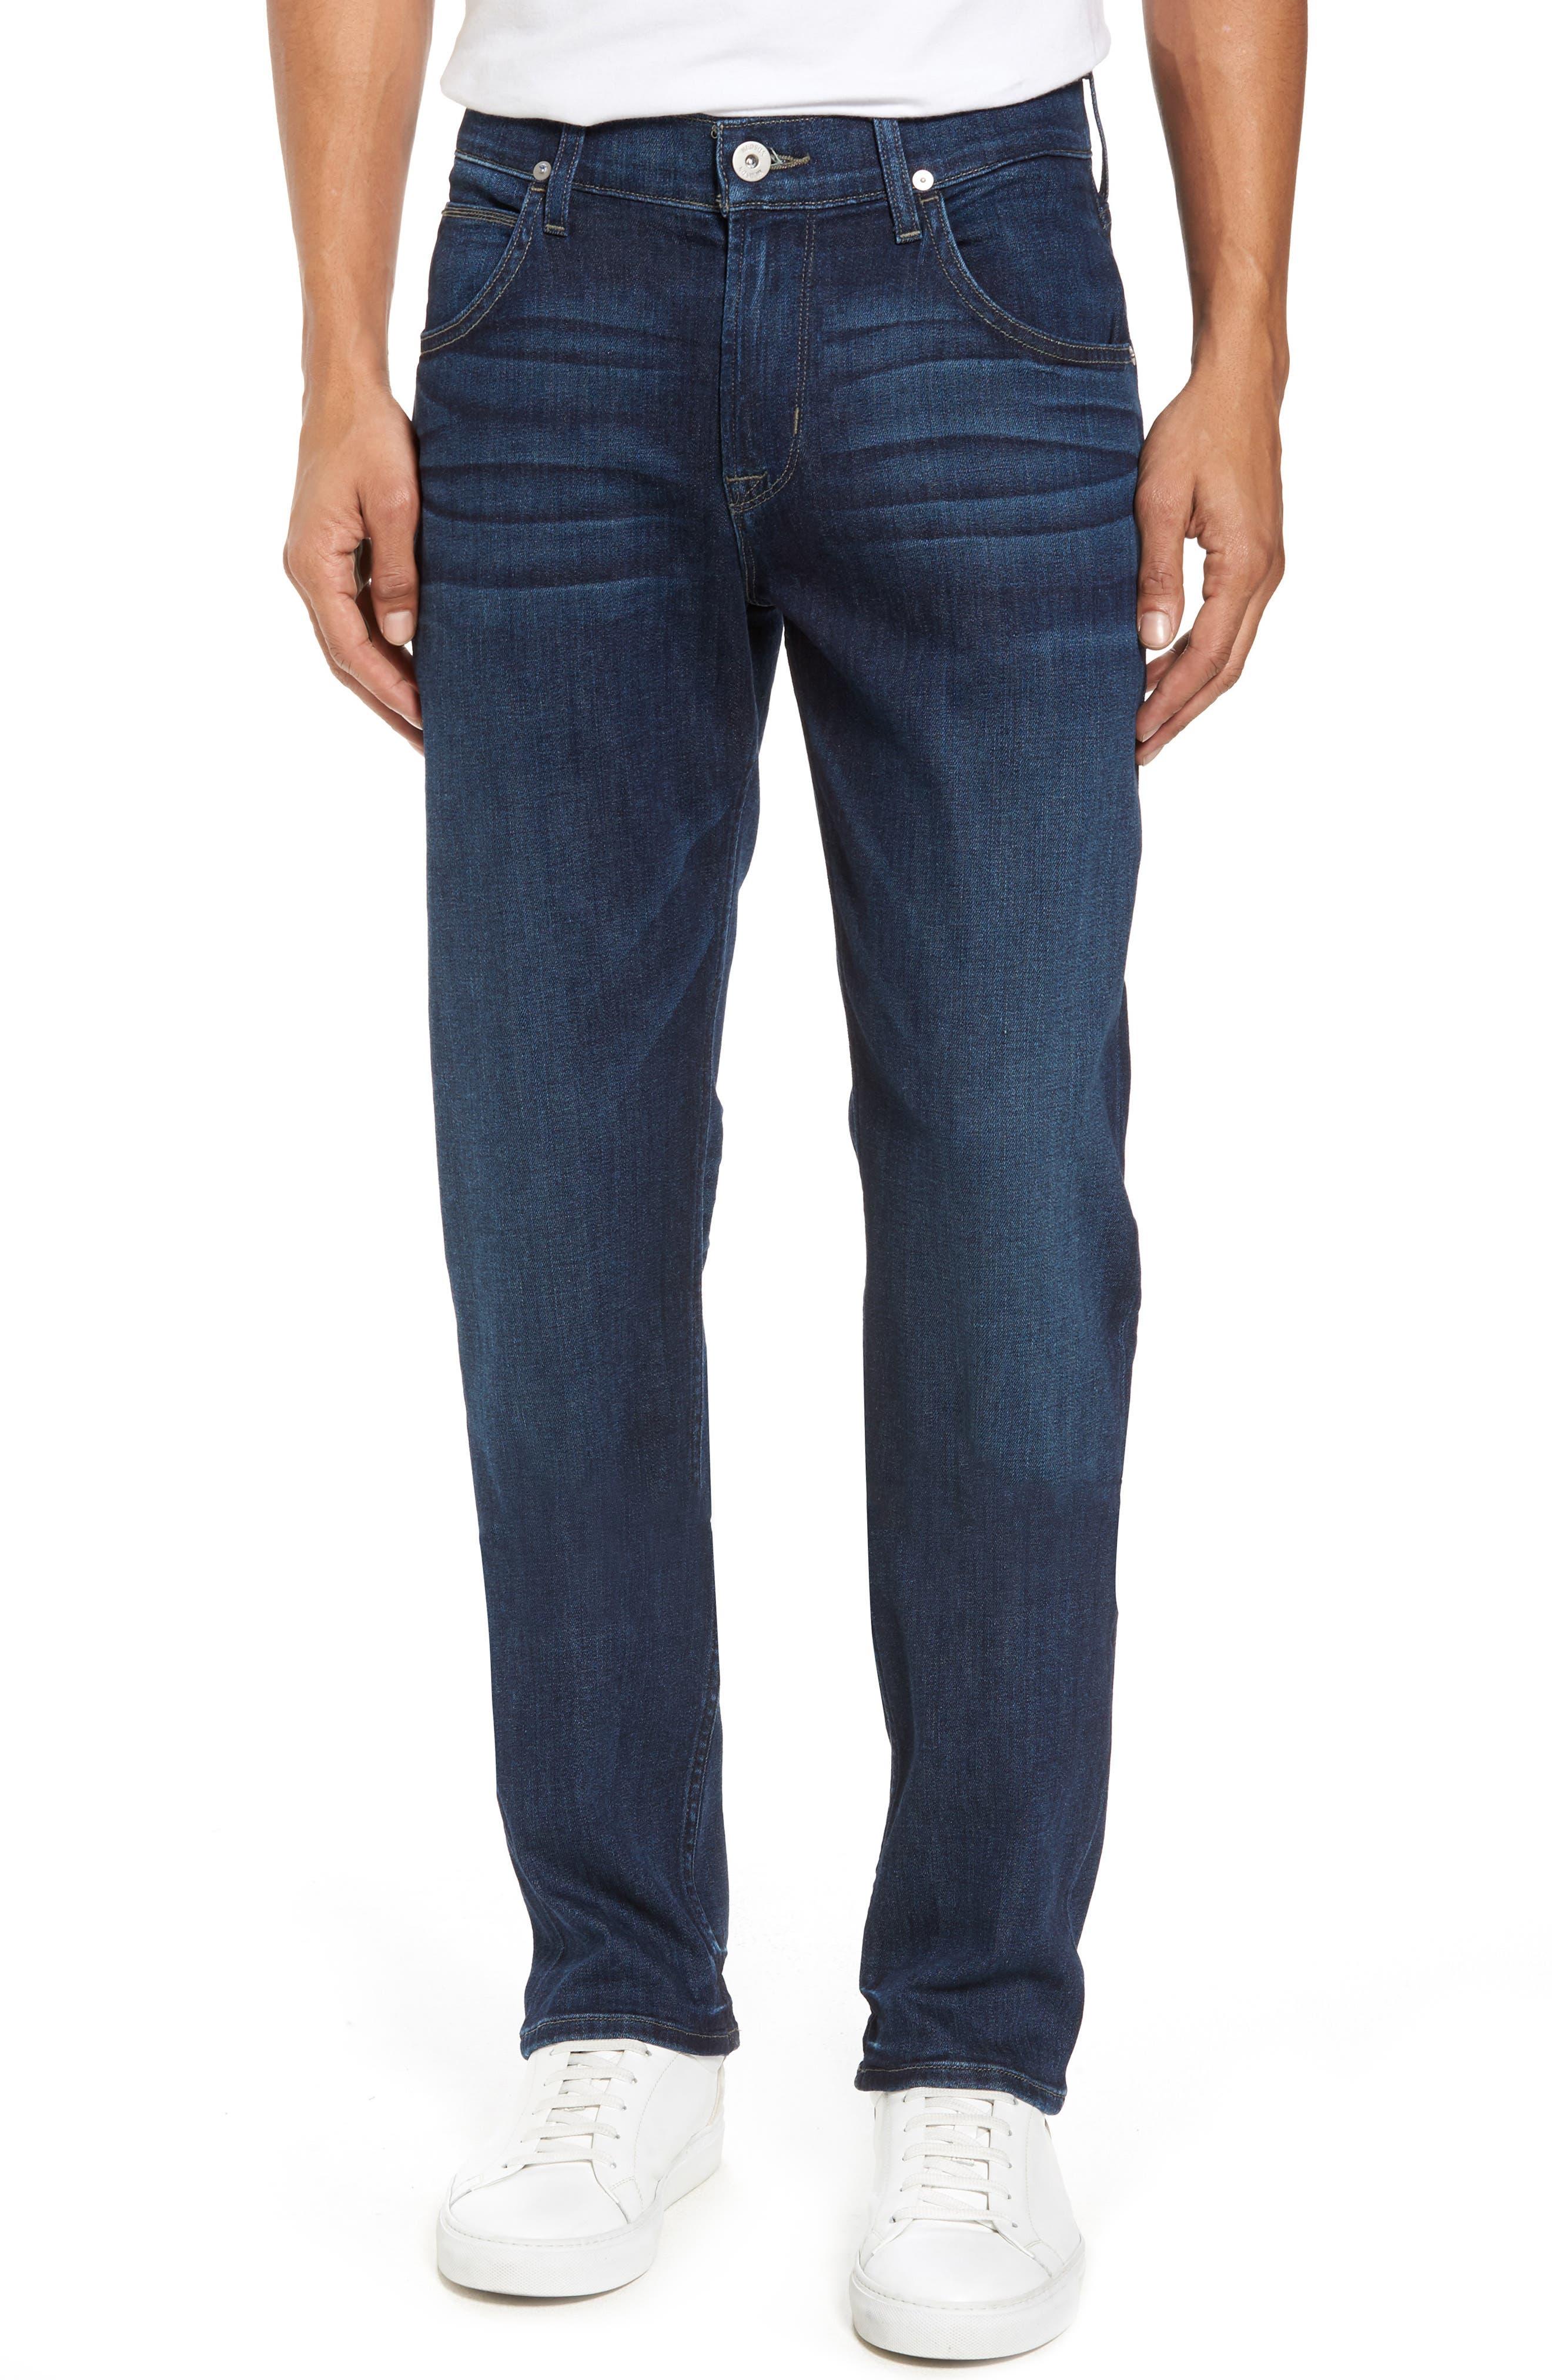 Alternate Image 1 Selected - Hudson Jeans Byron Slim Straight Fit Jeans (Draper)